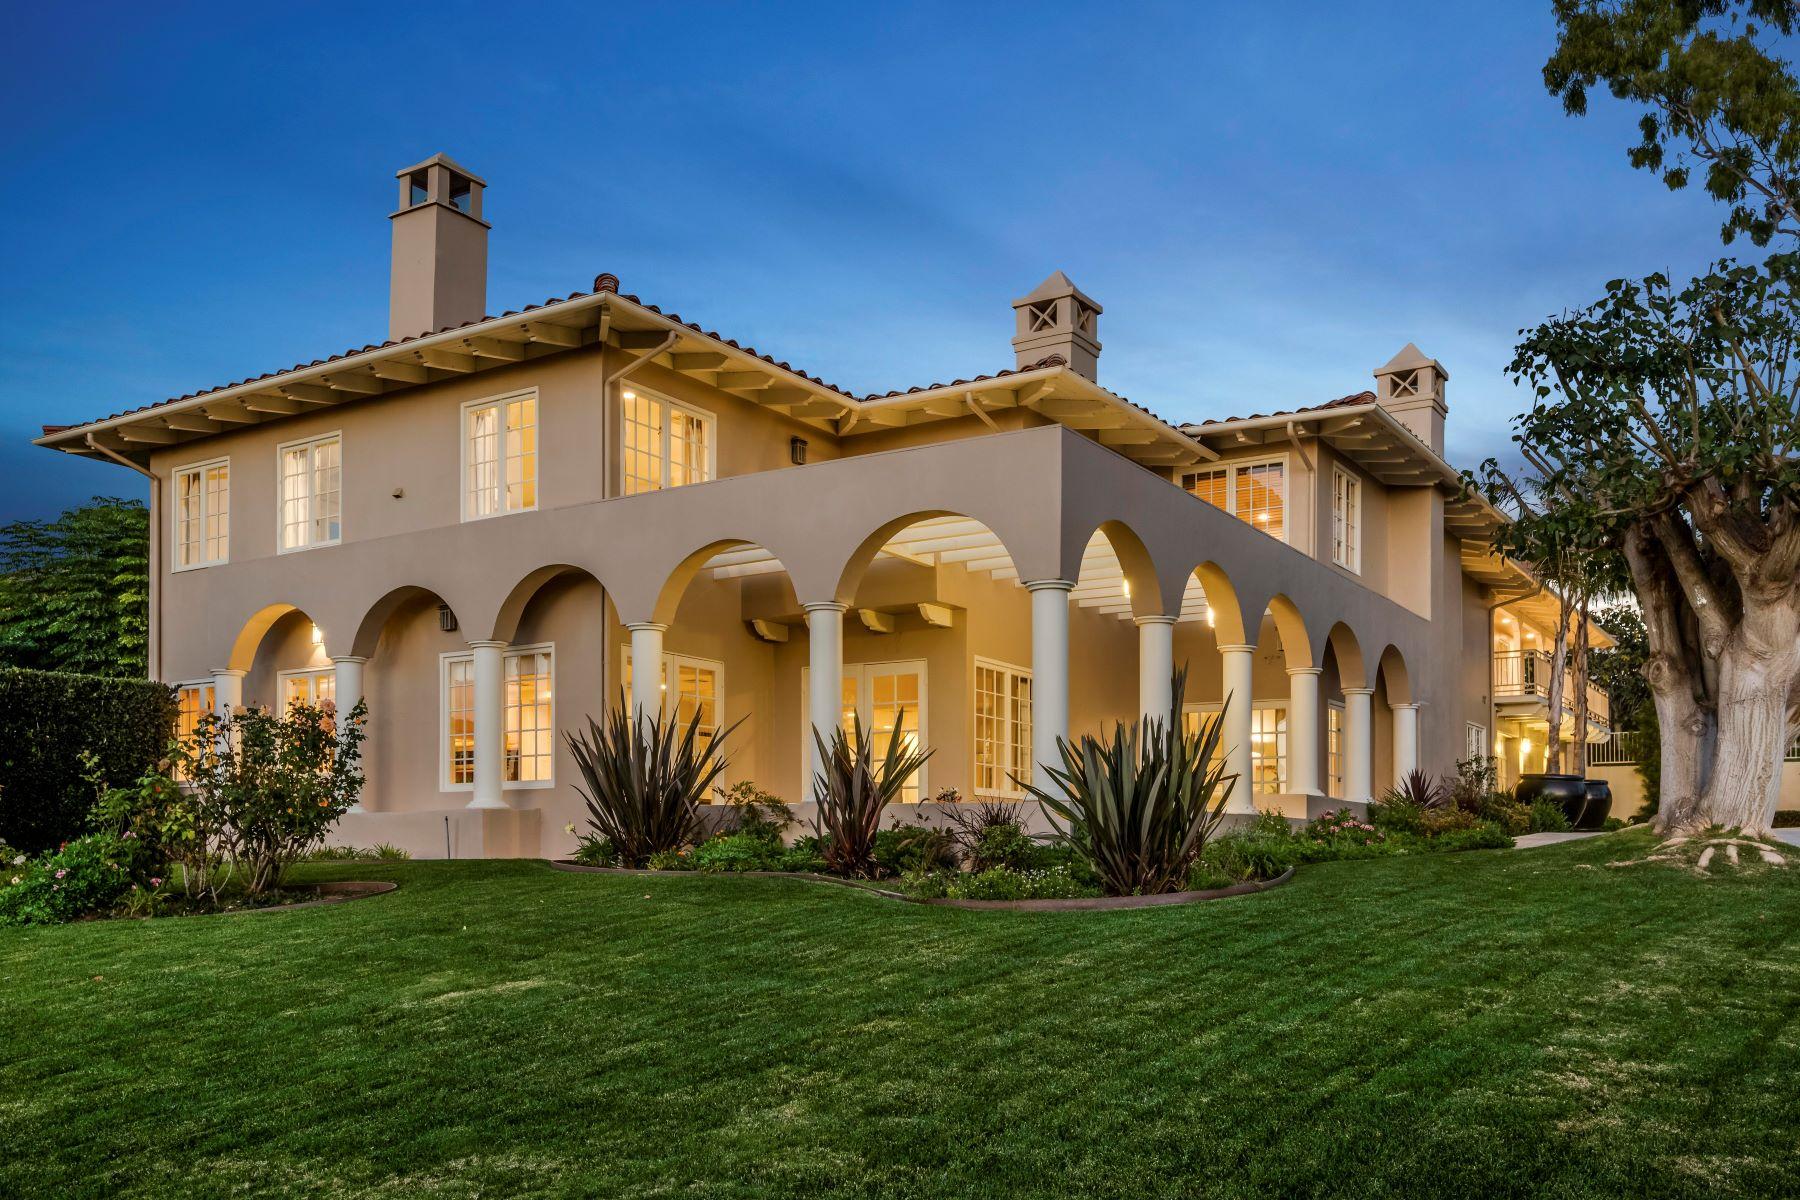 Imóvel para arrendar Palos Verdes Estates